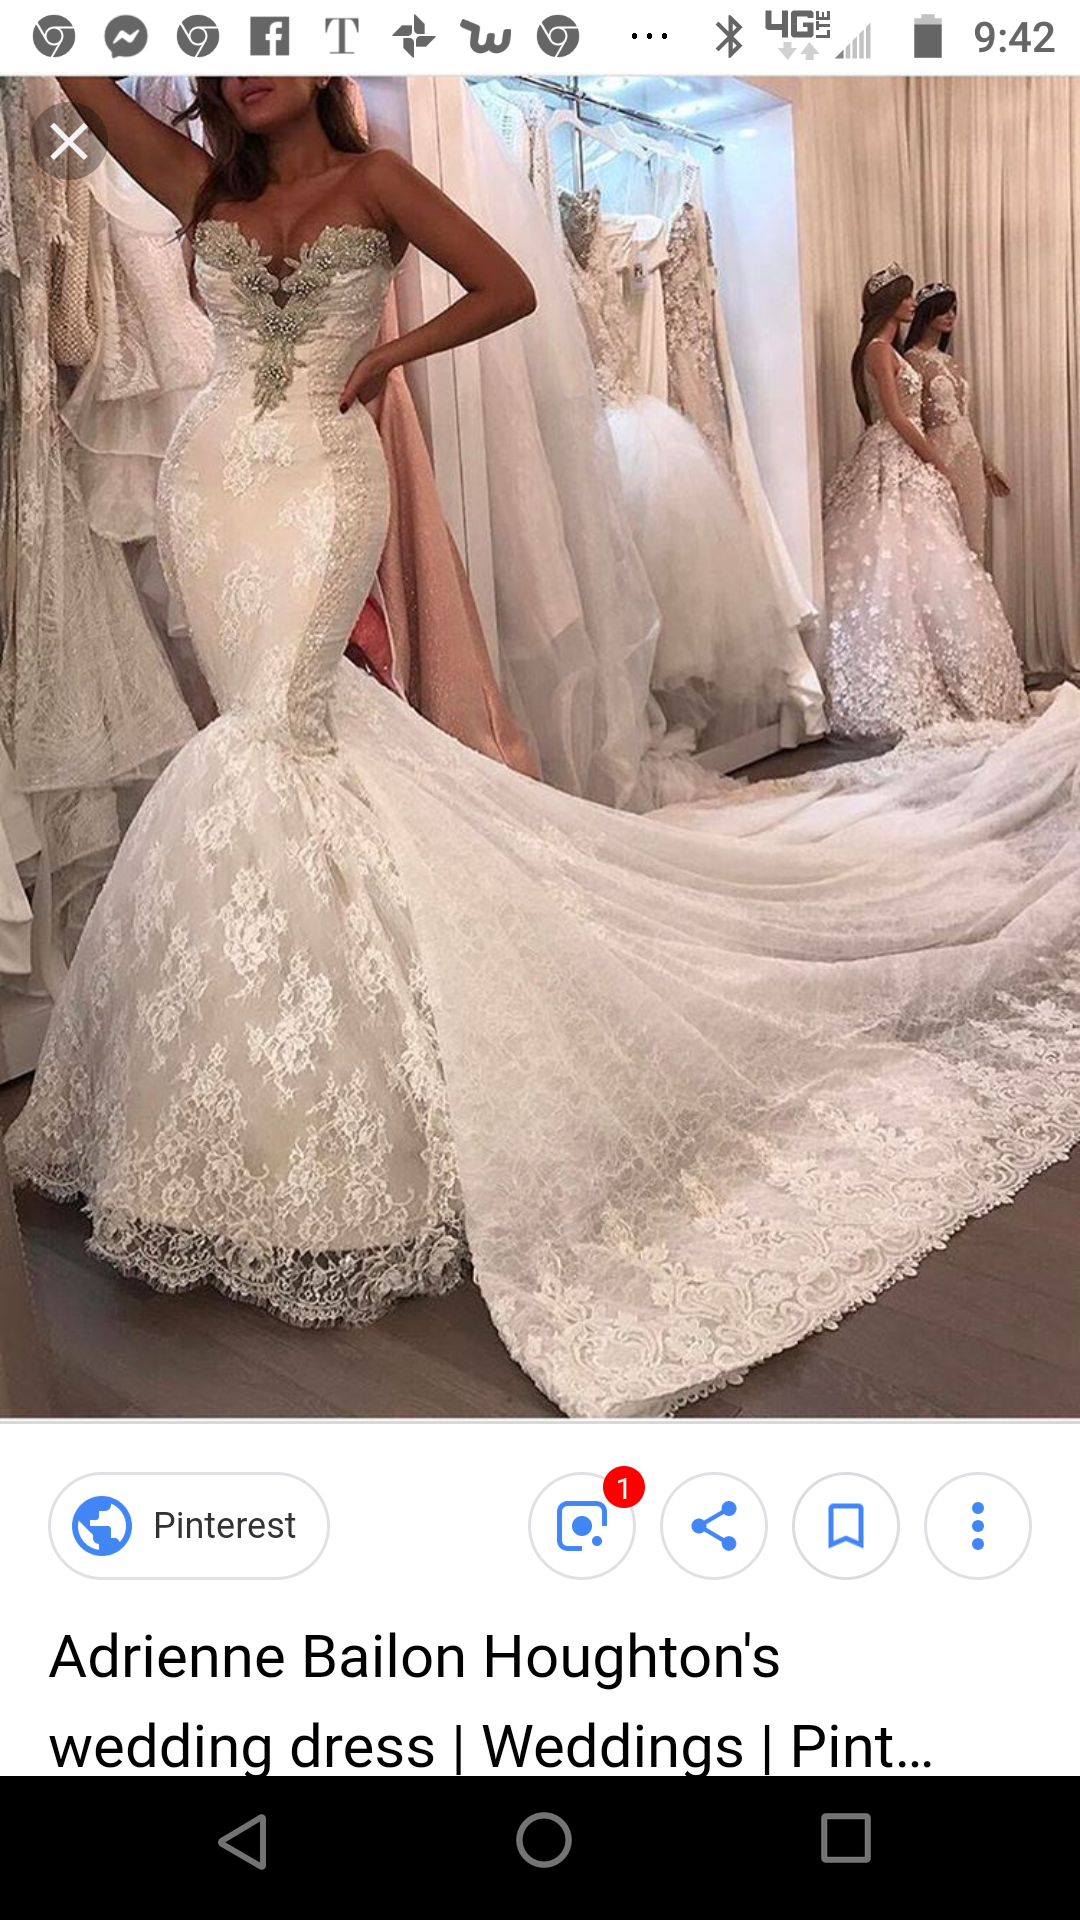 Adrienne Bailon Houghton Wedding Dress Lace Mermaid Wedding Dress Wedding Dresses Vegas Wedding Dress